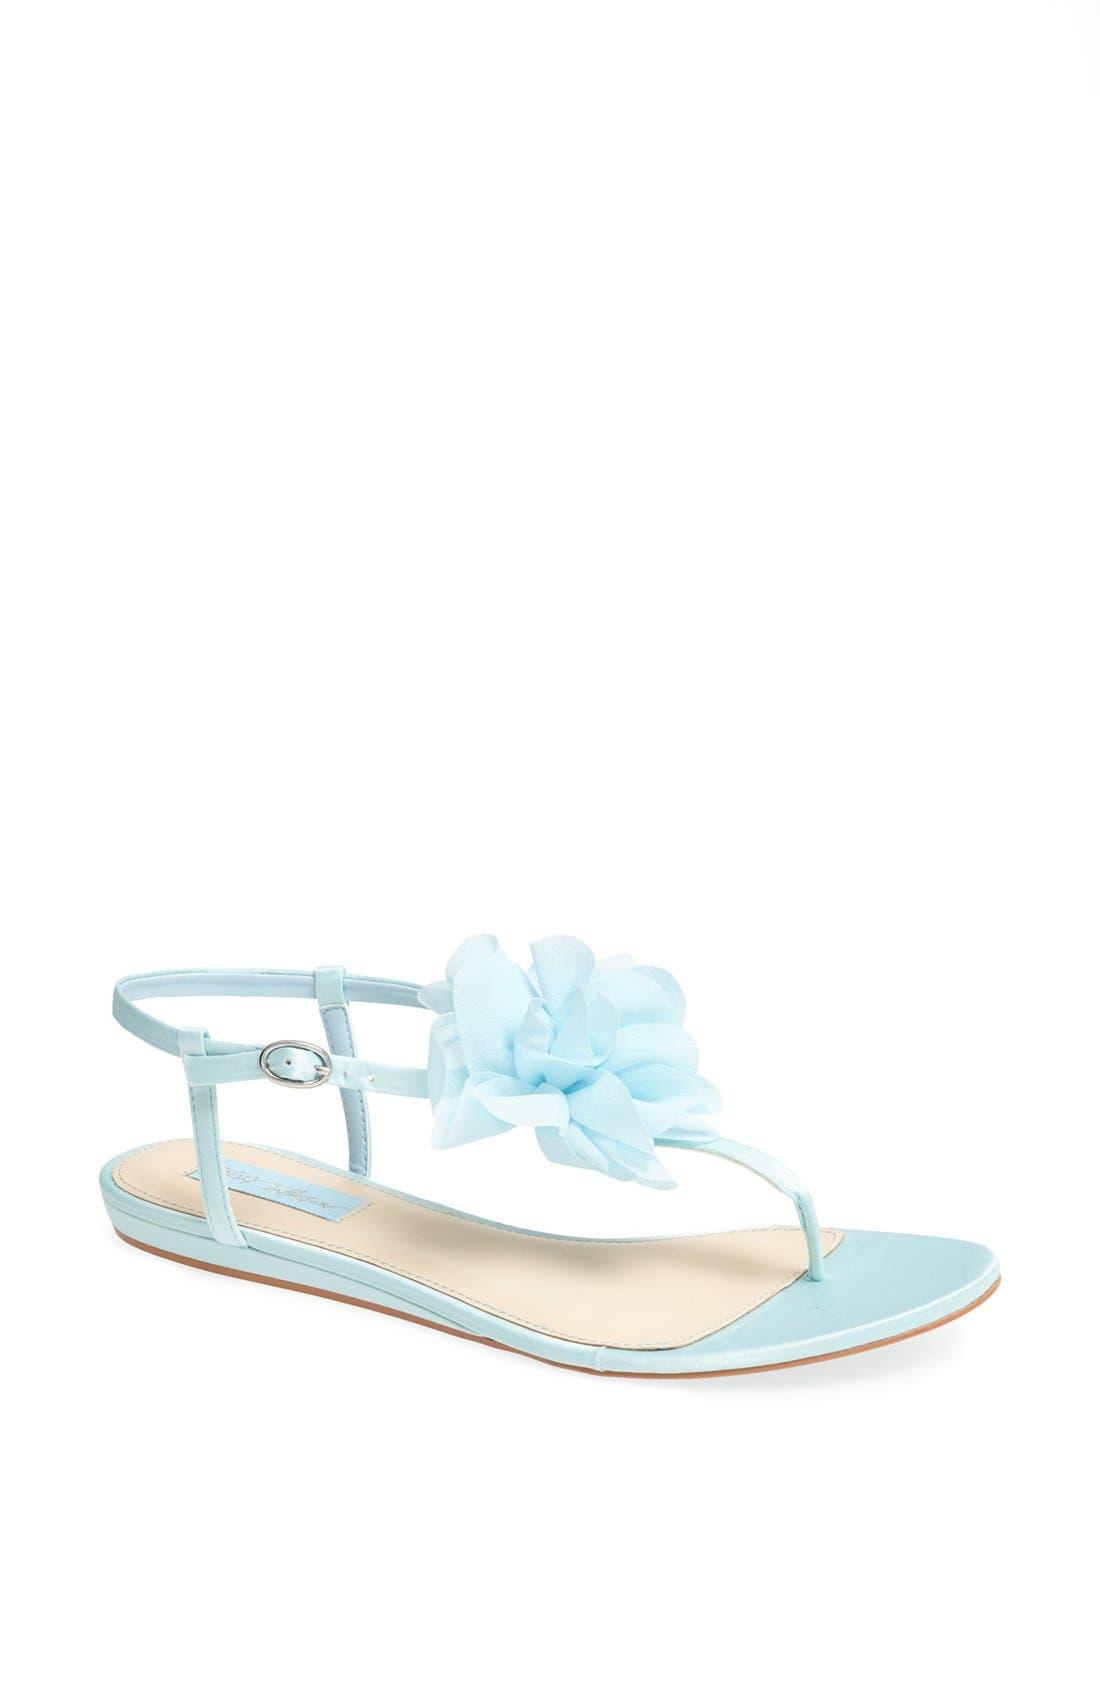 Alternate Image 1 Selected - Blue by Betsey Johnson 'Iris' Thong Sandal